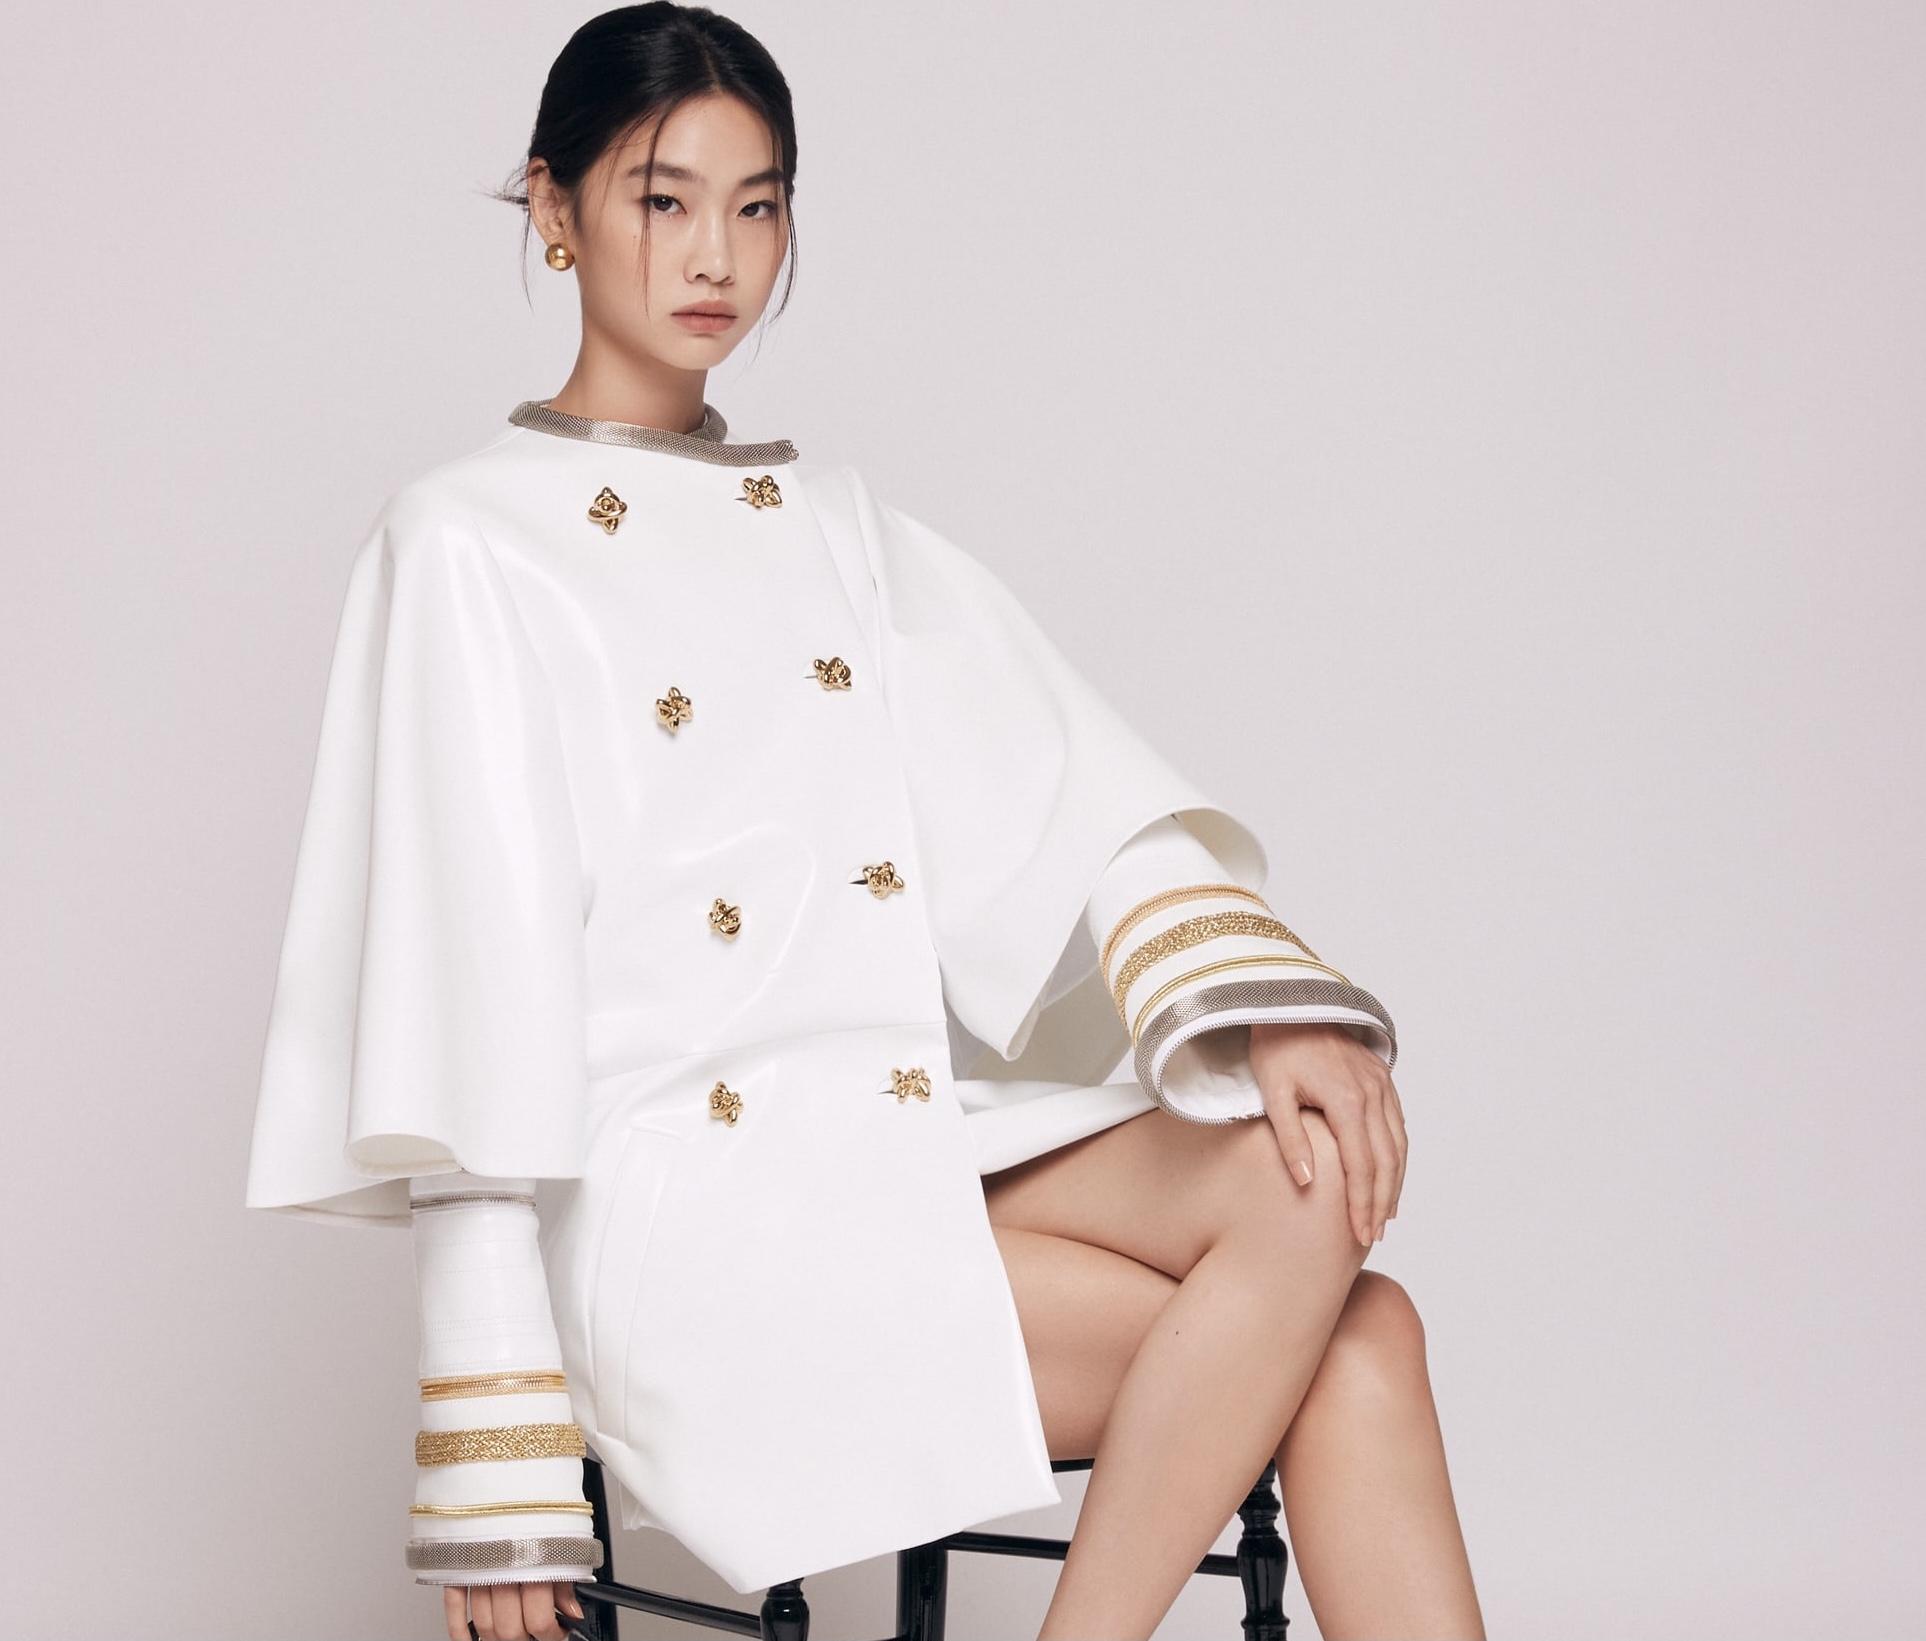 Ho-yeon mangsa eksploitasi fesyen mewah?